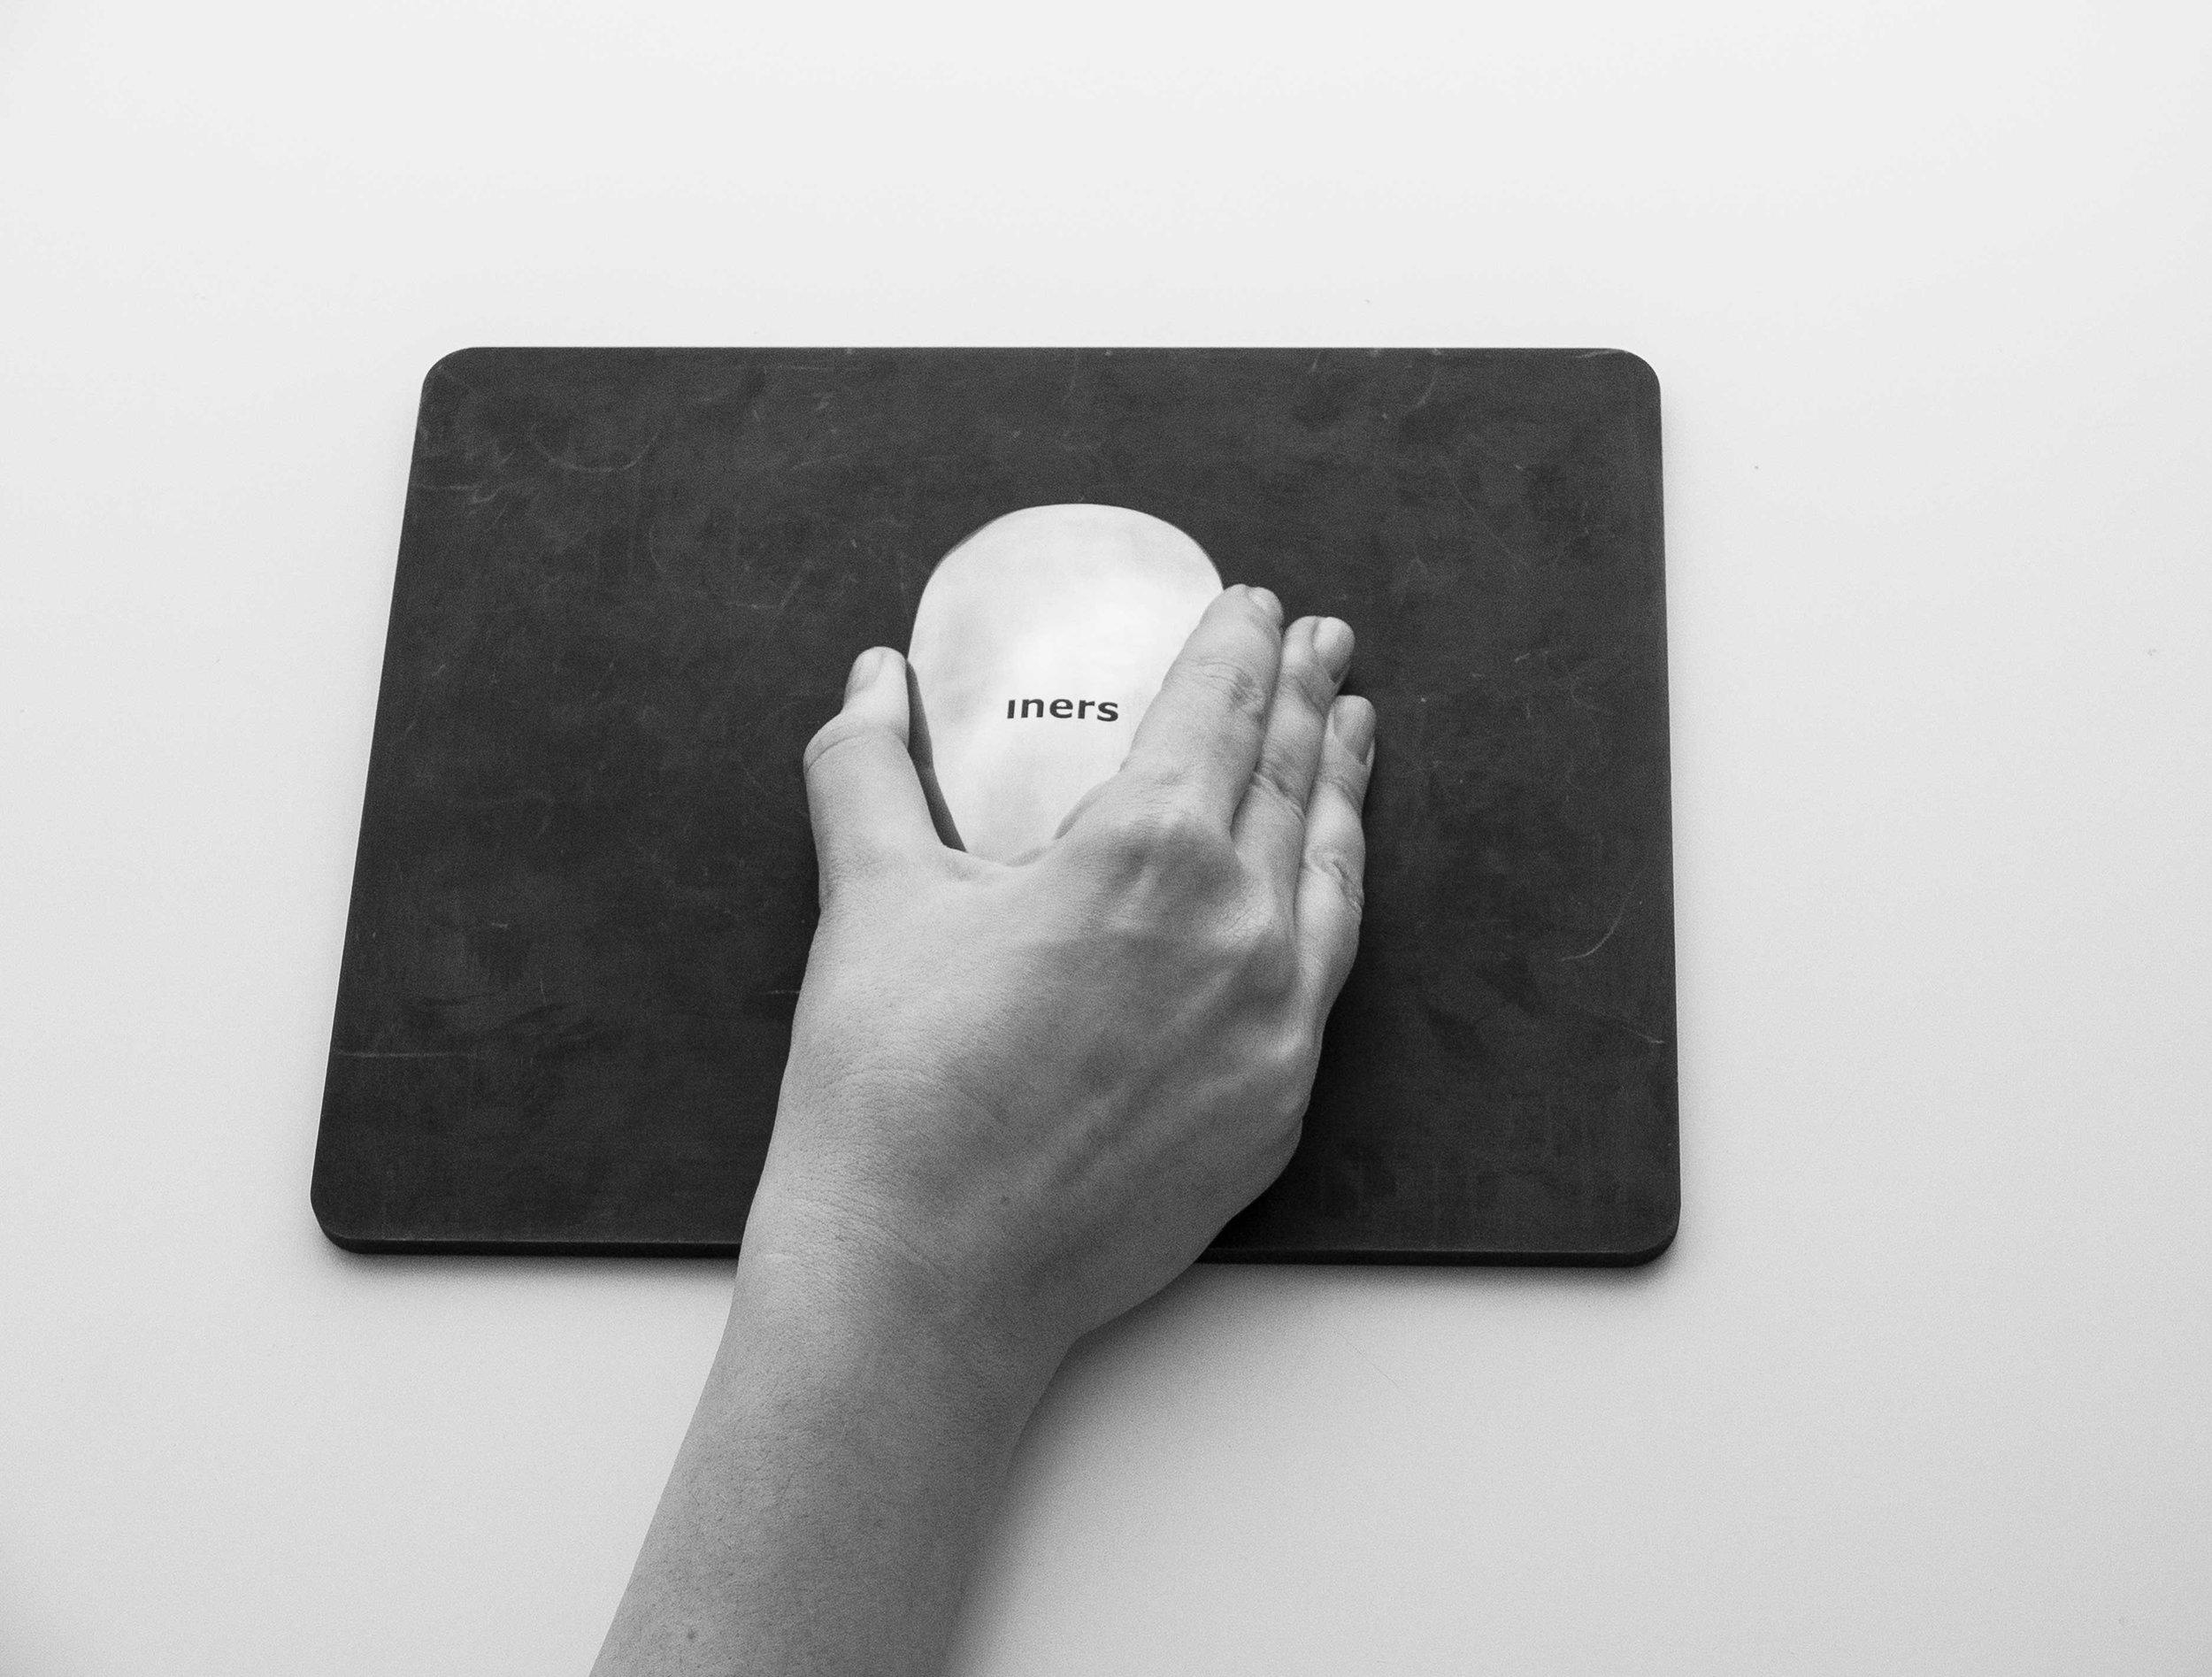 Torrent 2012, the web therapist